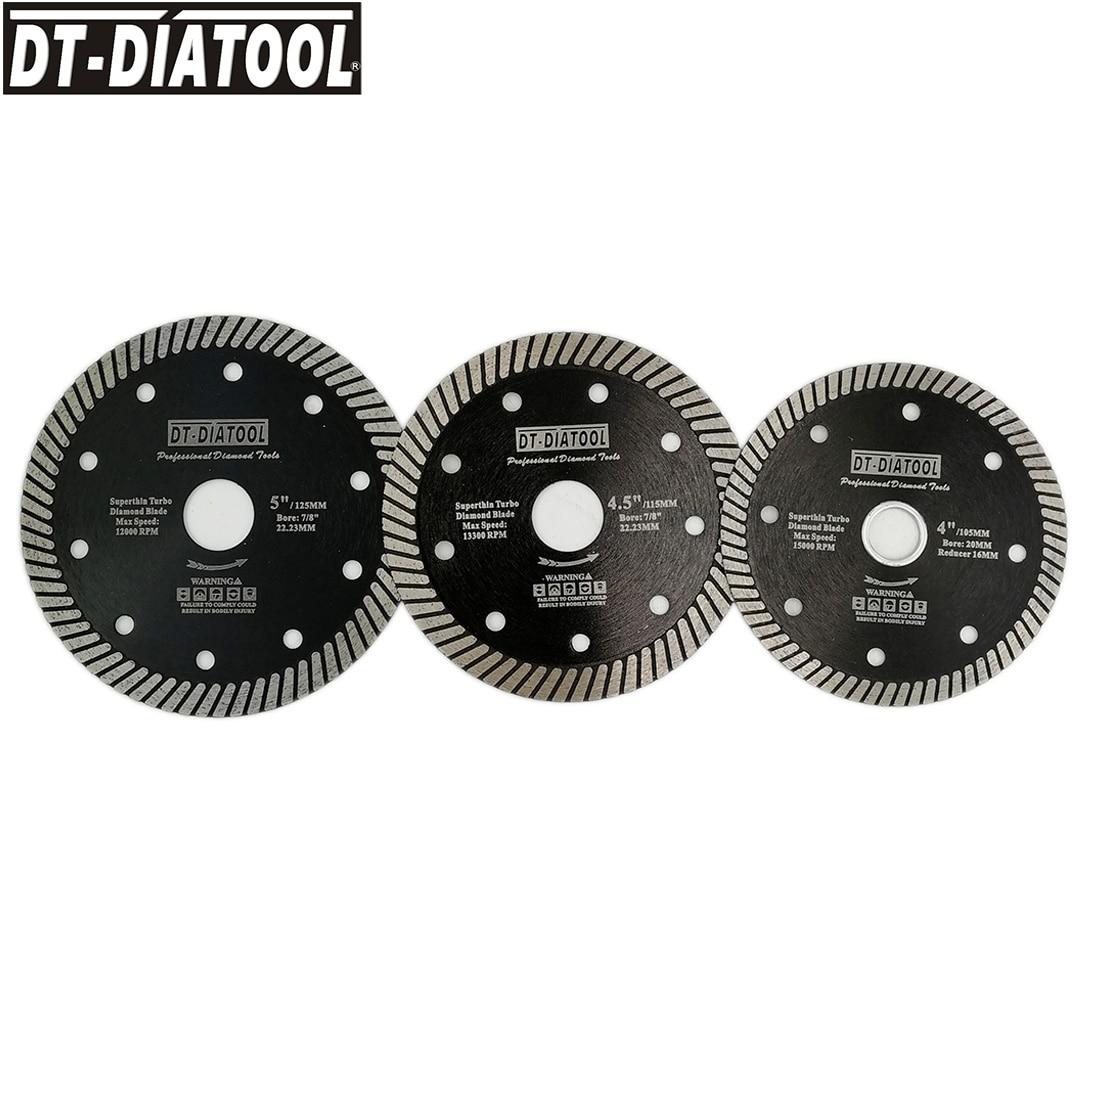 DT-DIATOOL 1pc Super-Thin Hot Pressed Turbo Diamond Saw Blade Cutting Disc Dia 105/115/125mm Cutting Wheel Marble Tile Granite